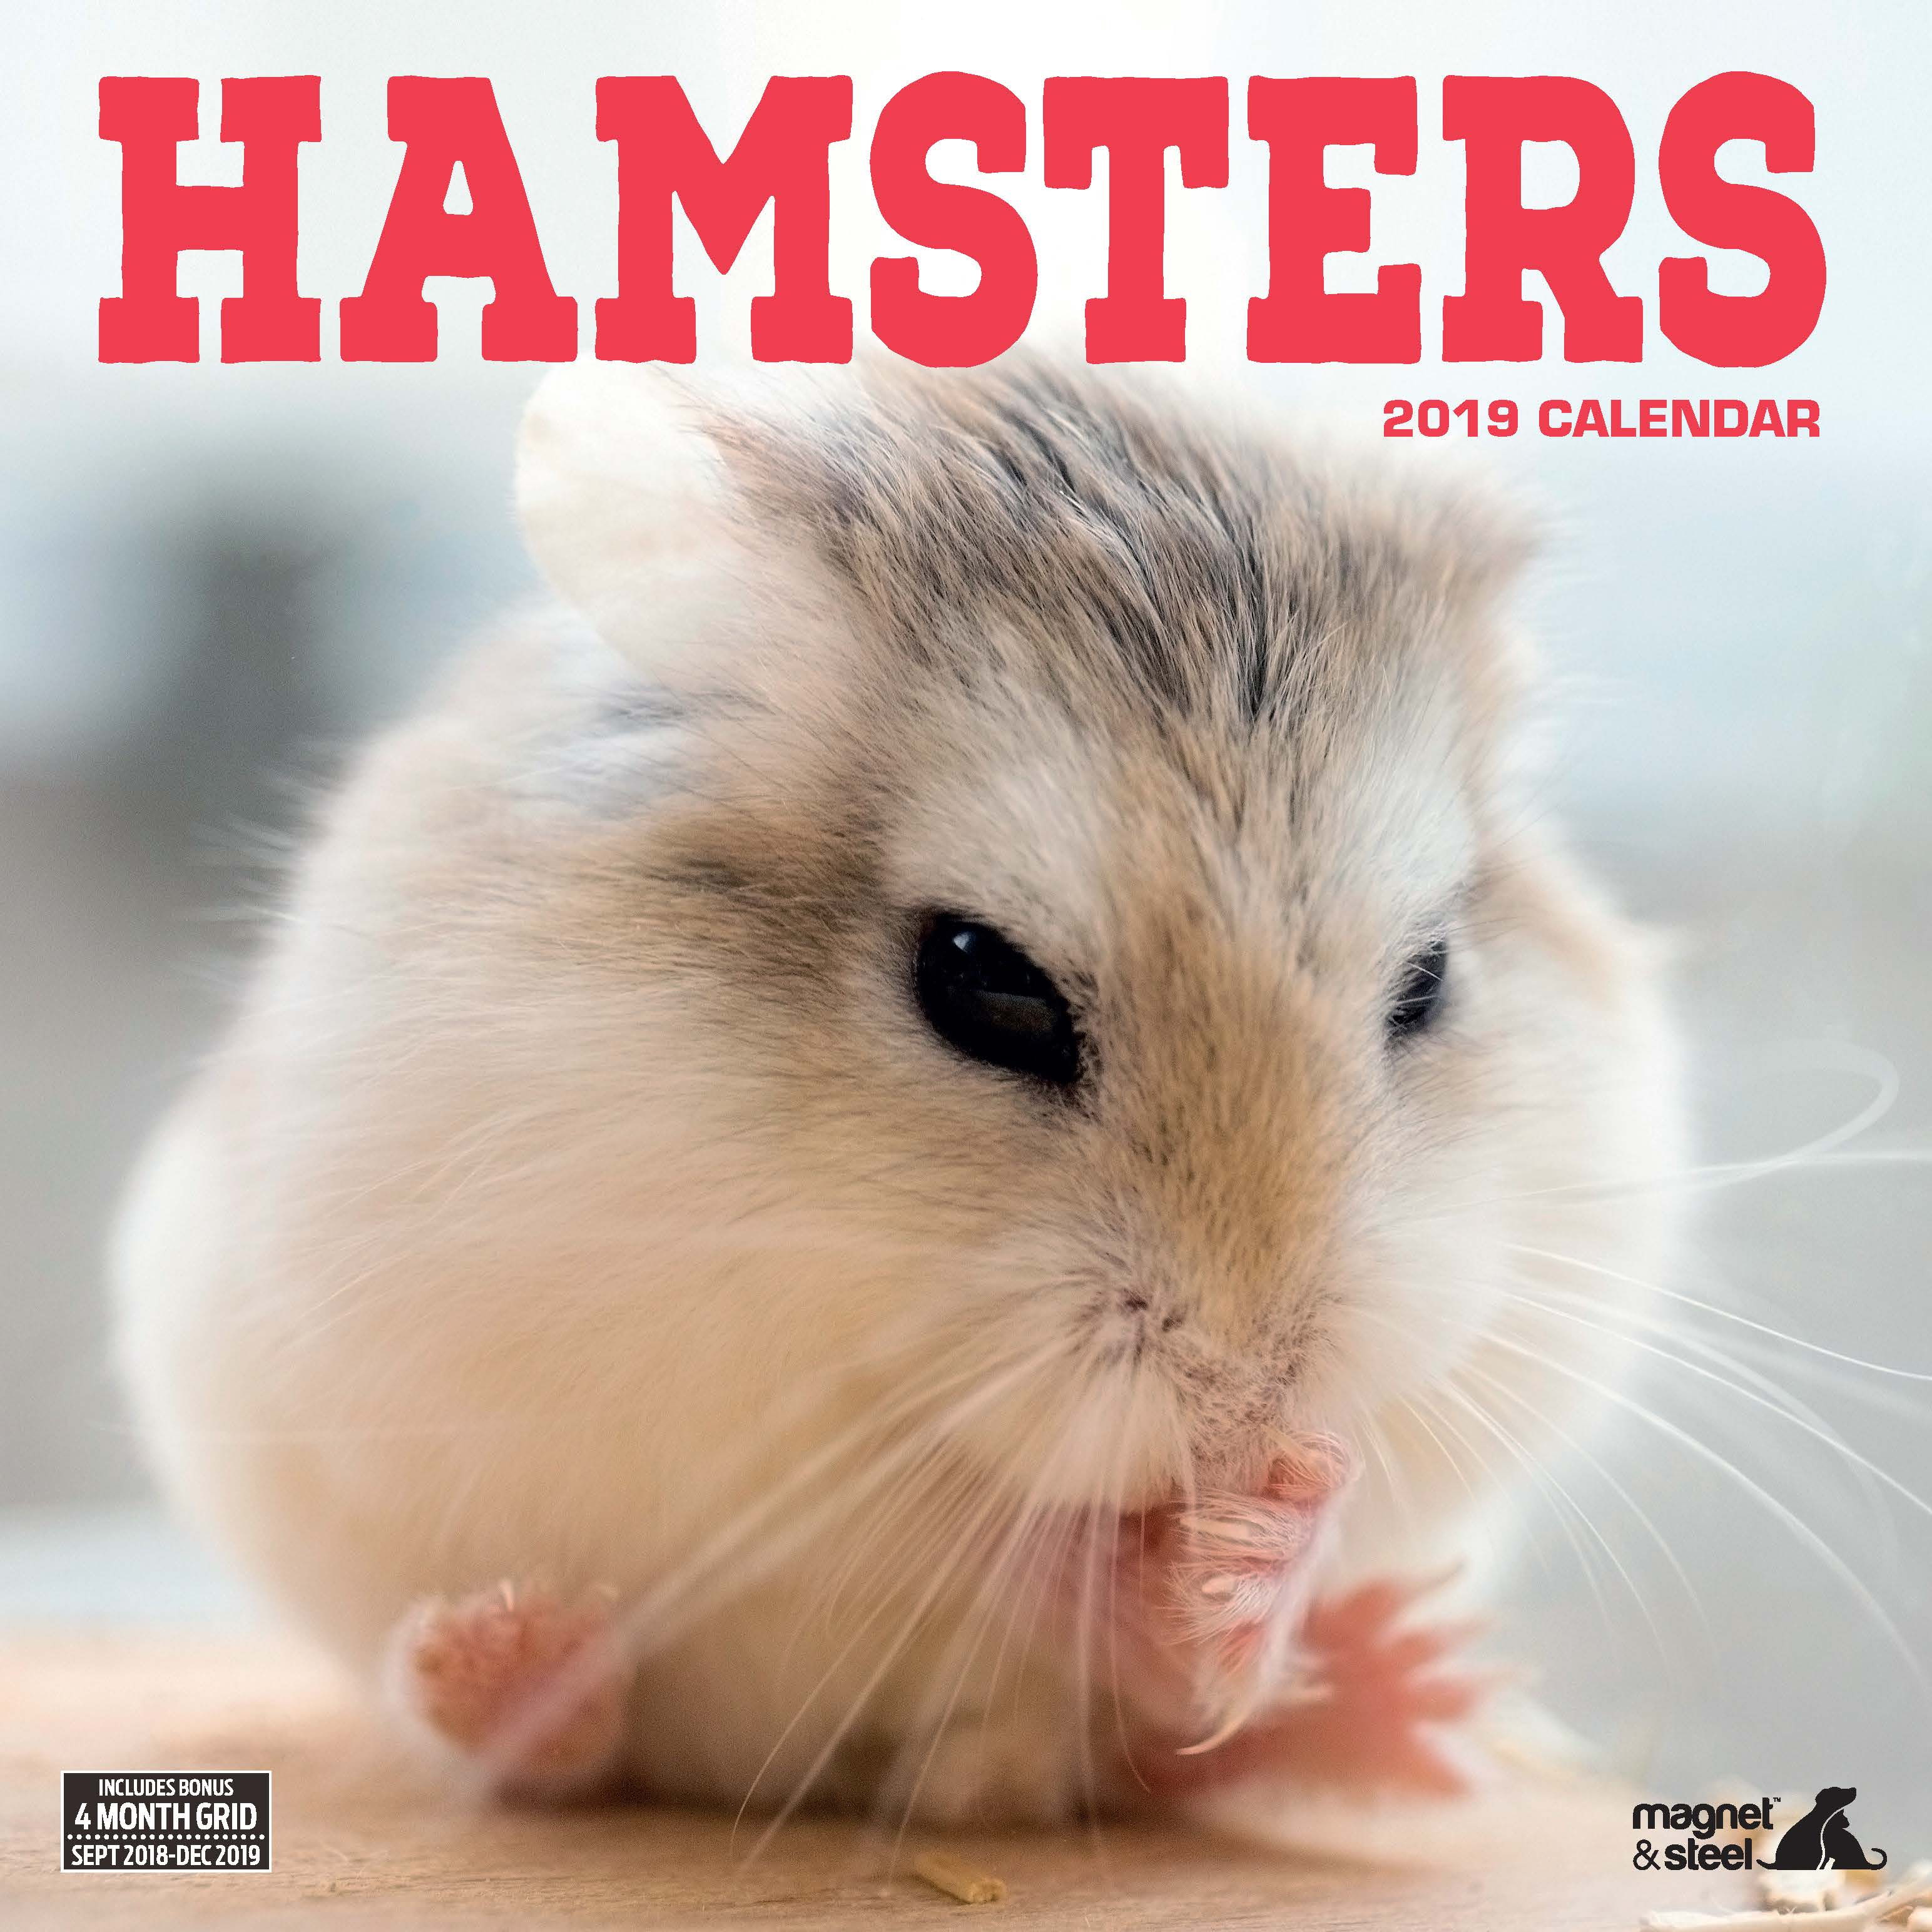 Hamsters 2019 Calendar